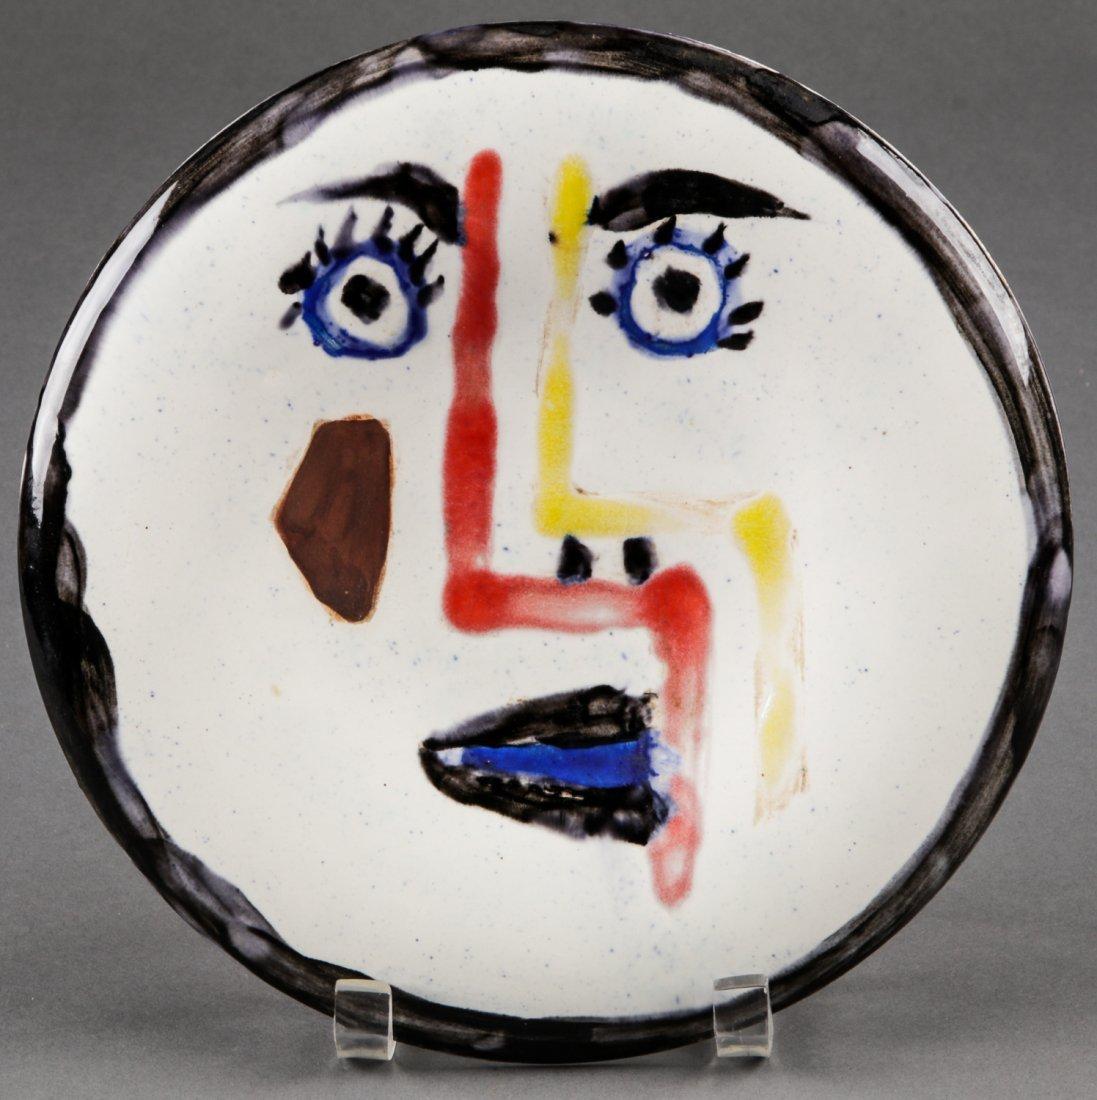 Pablo Picasso (1881-1973) Visage no. 192